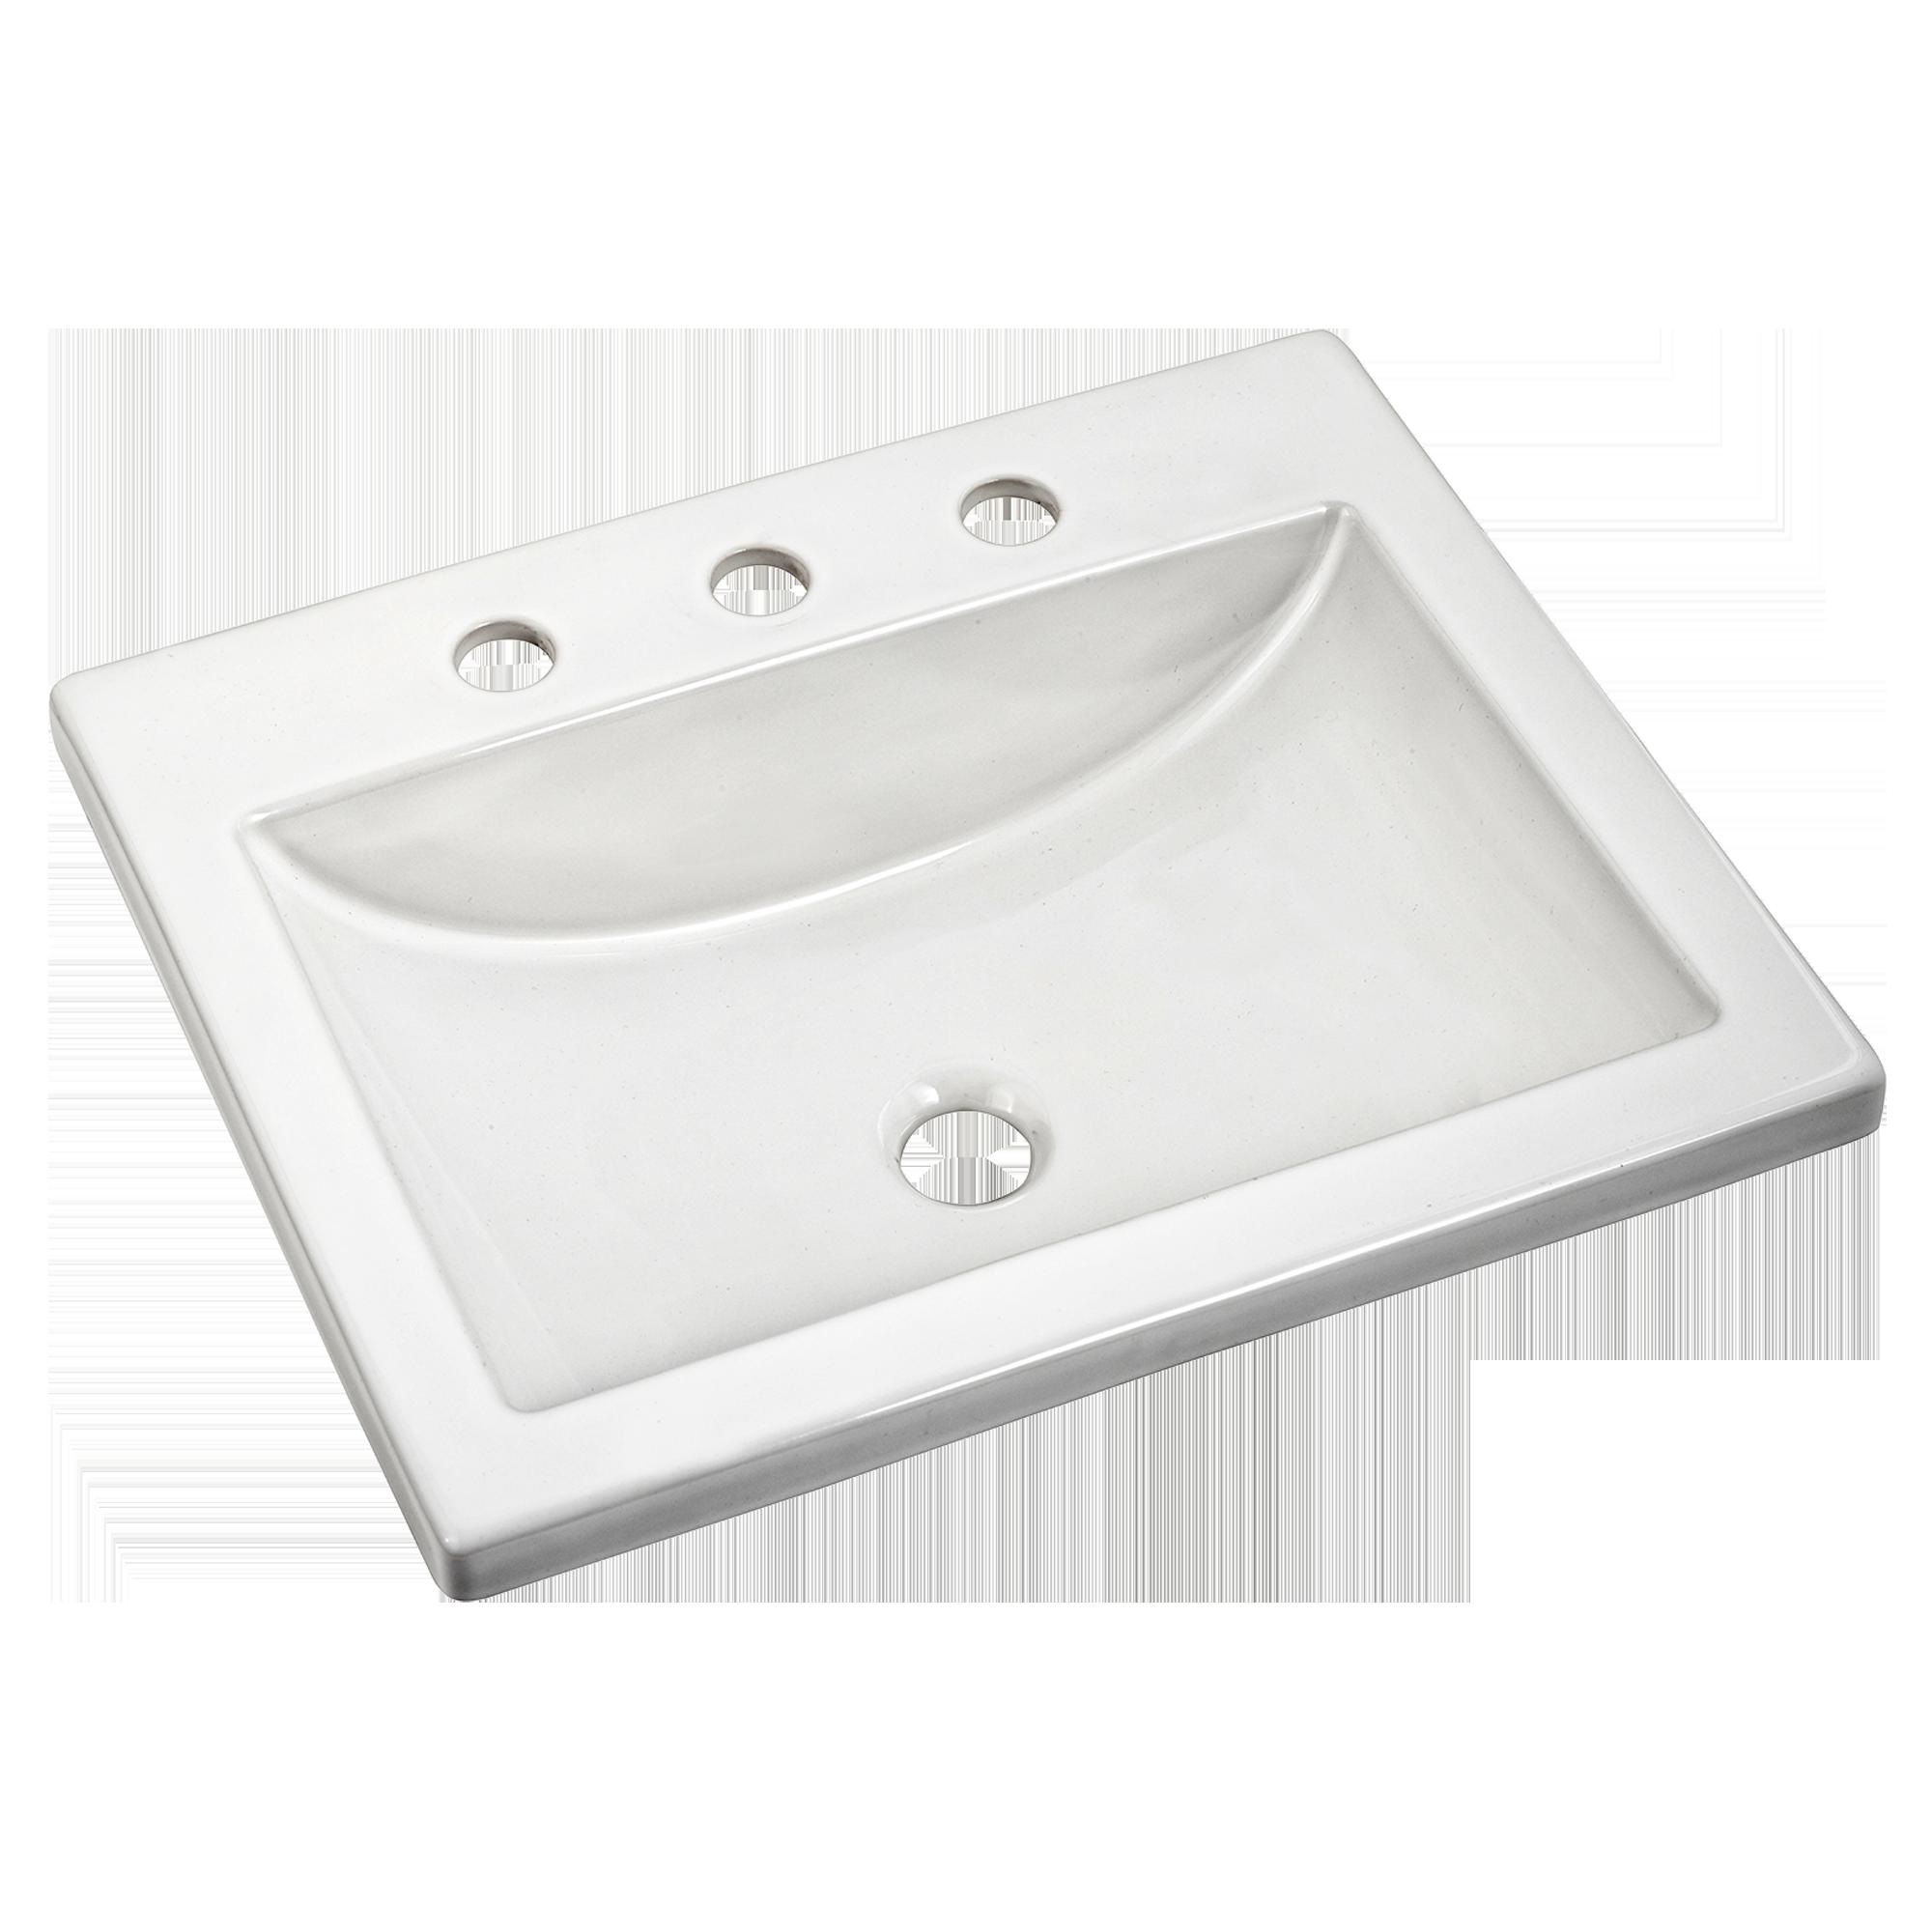 Drop In Bathroom Sinks Latest Studio Drop In Bathroom Sink American Standard Wallpaper